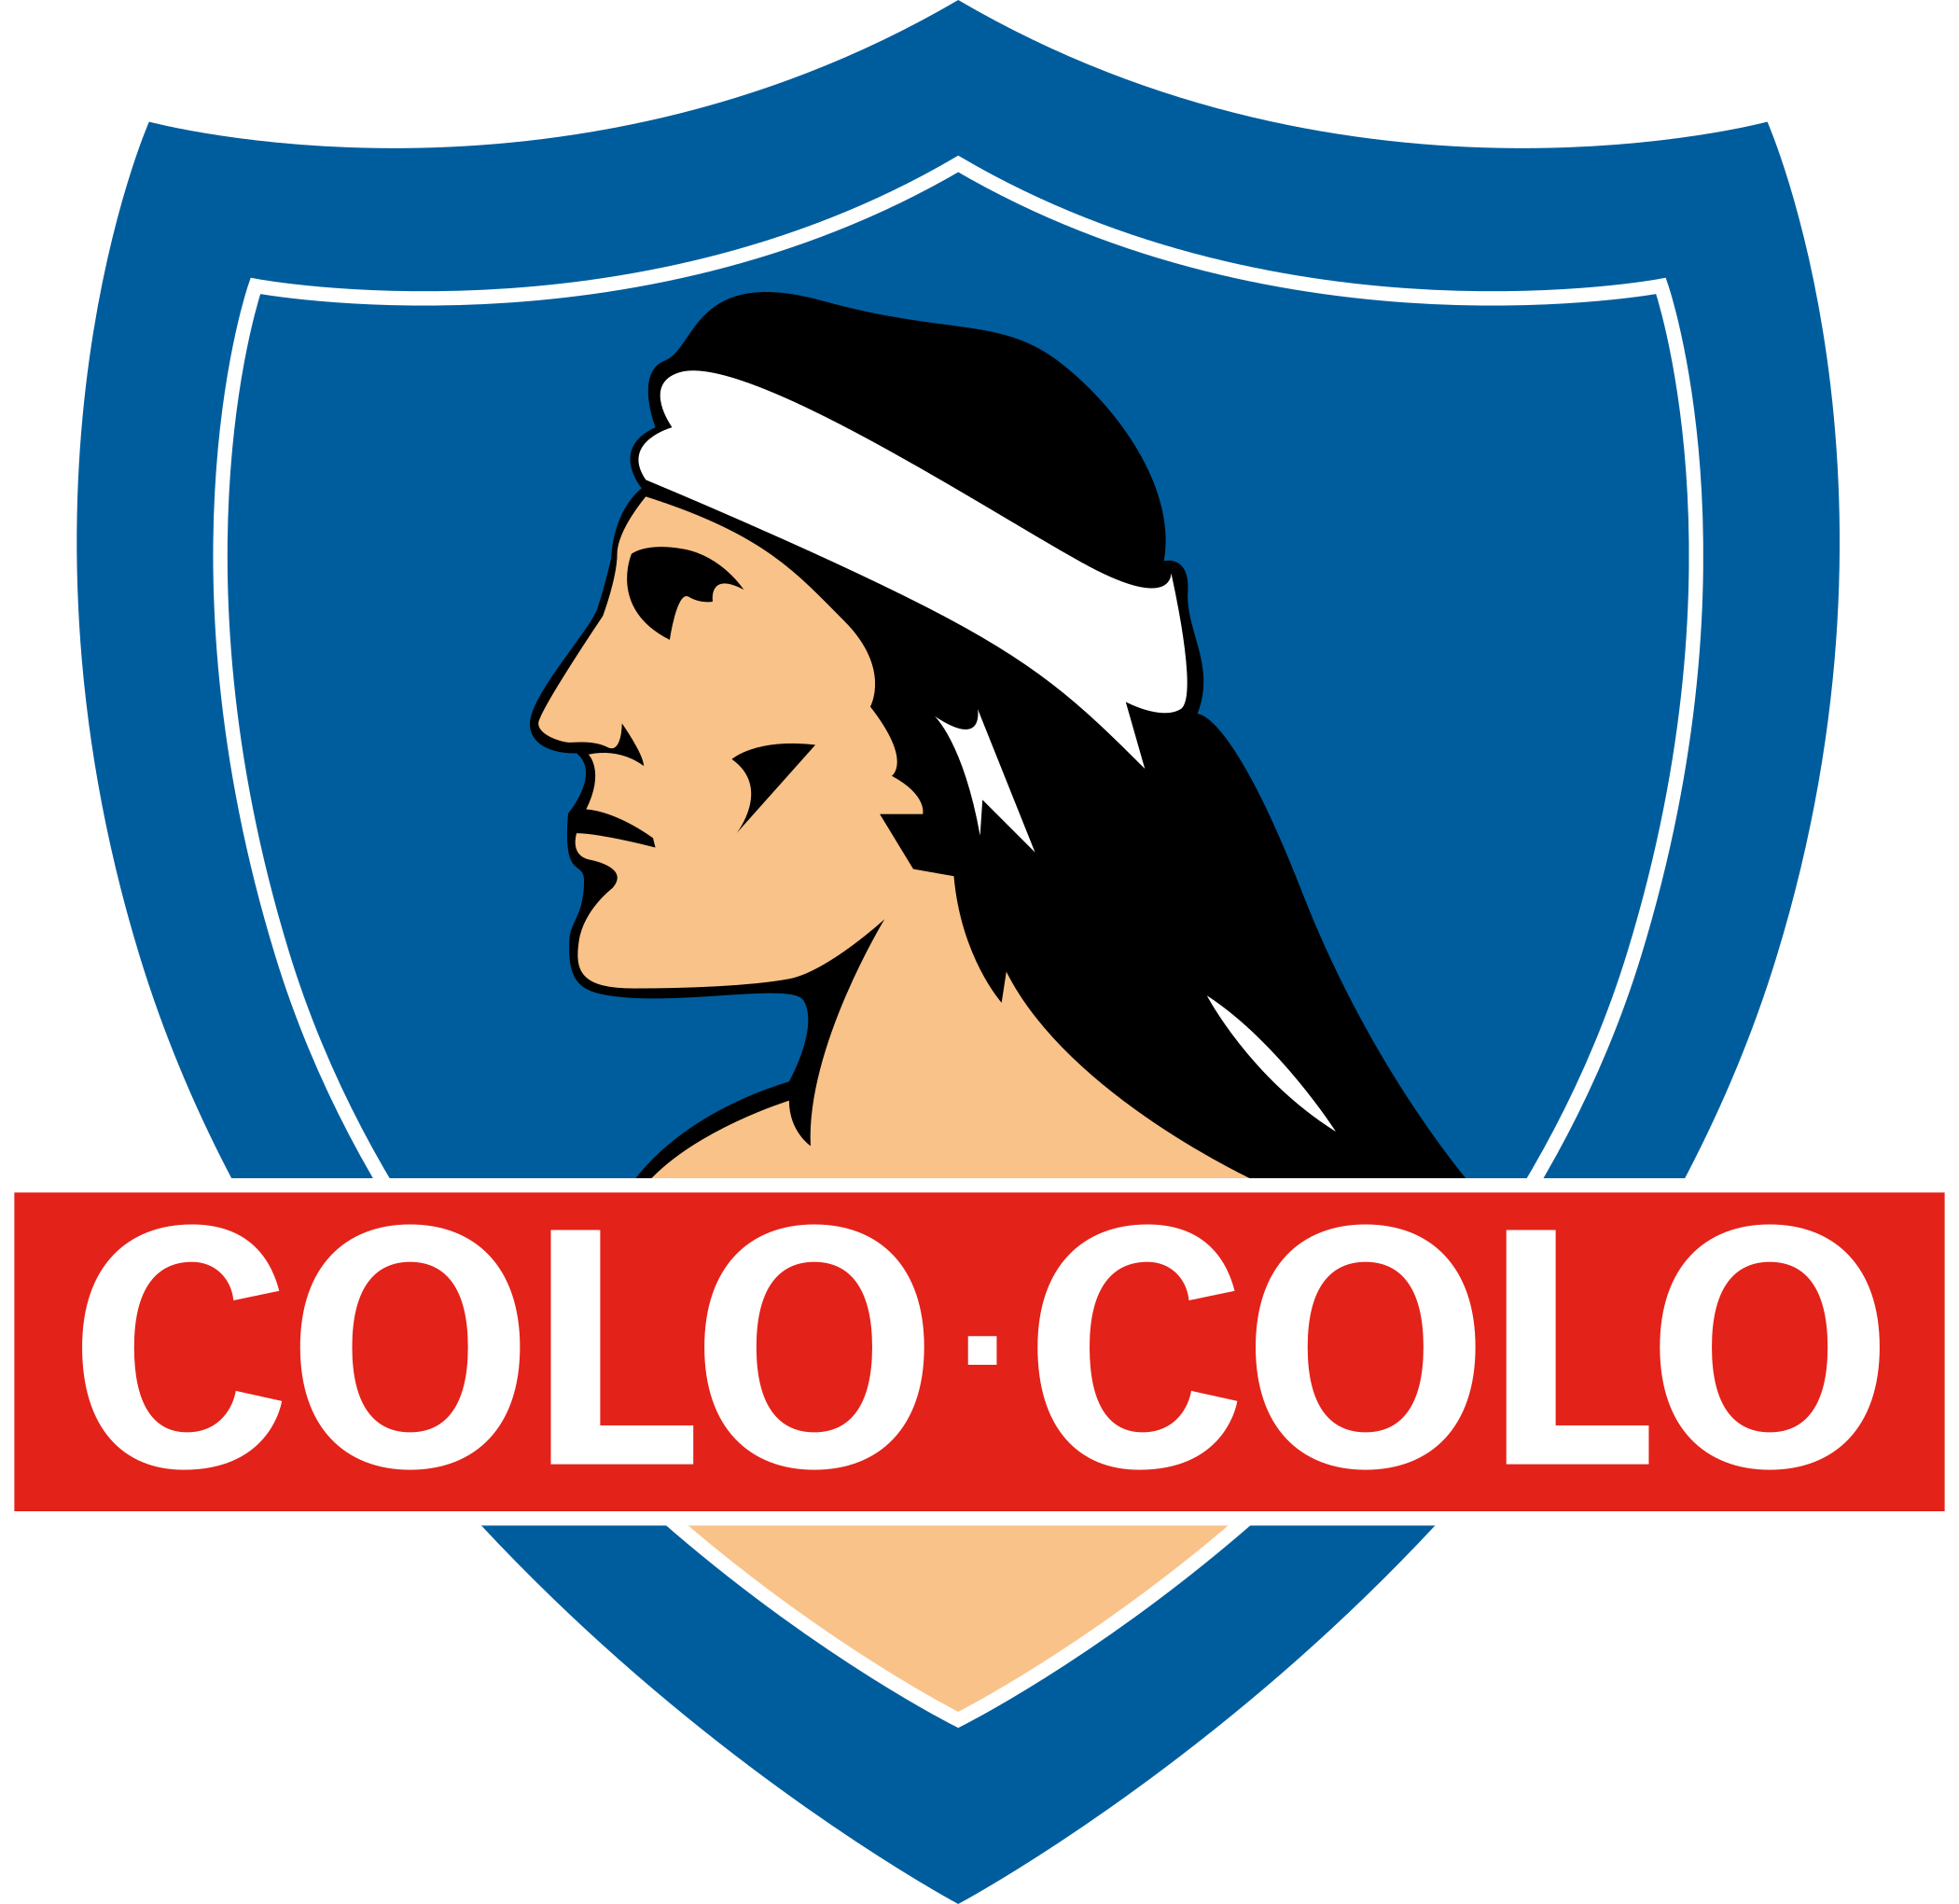 colo colo logo escudo 1 - Colo Colo Logo - Escudo